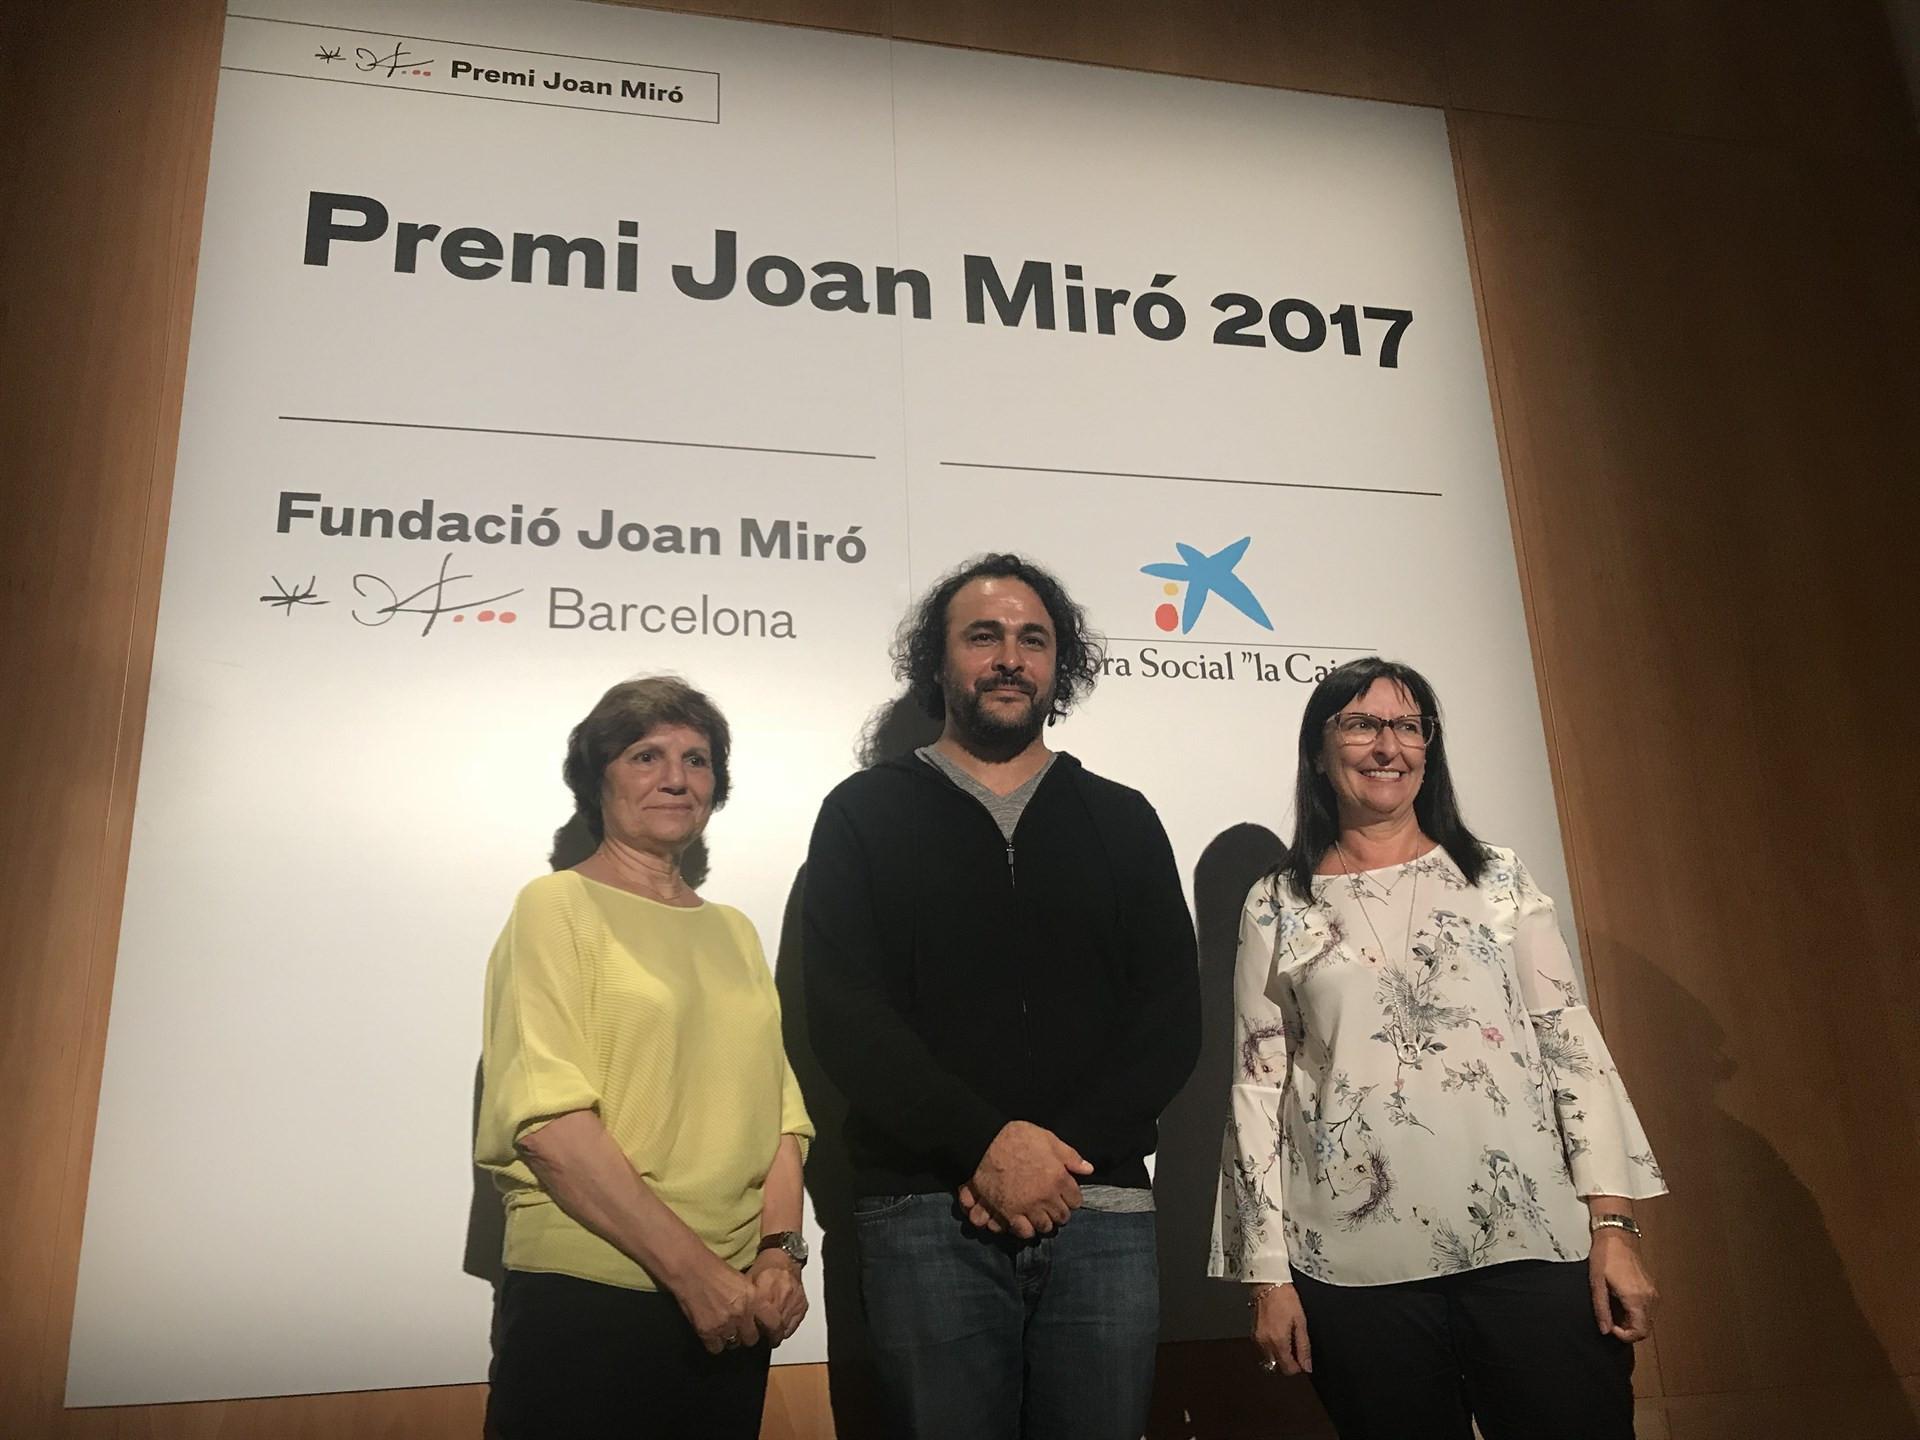 Kader Attia Premi Joan Miro